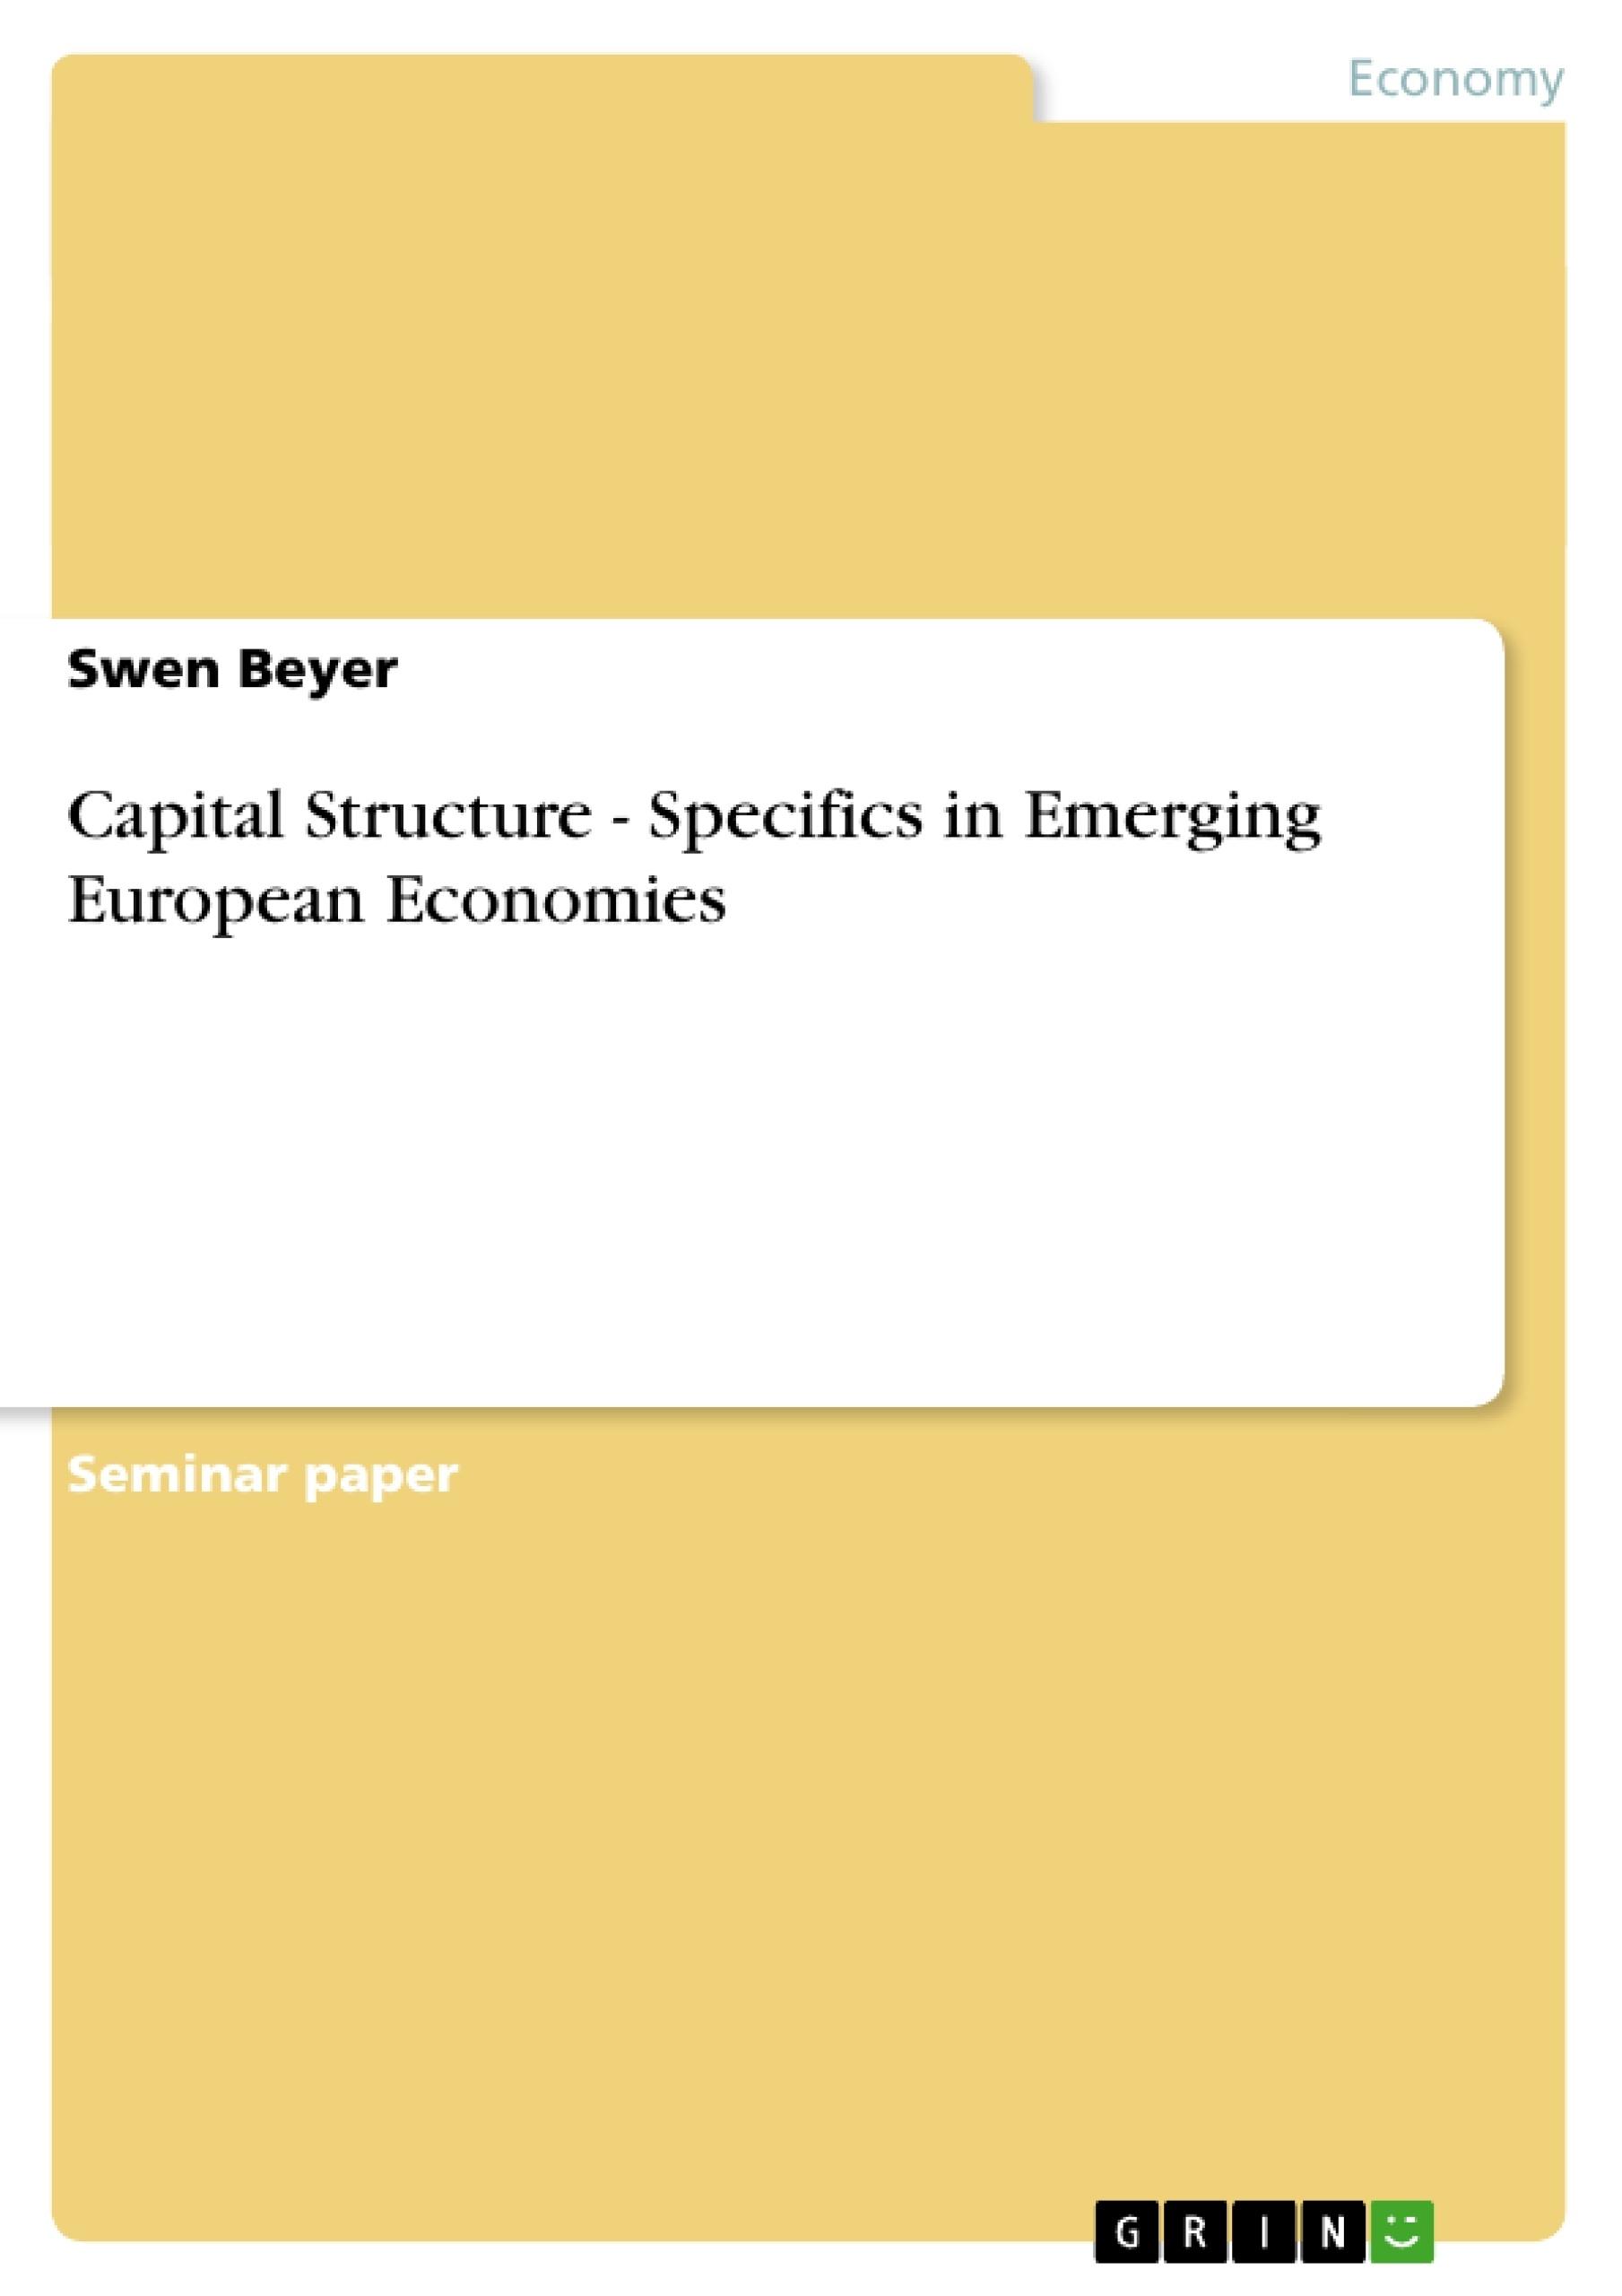 Title: Capital Structure - Specifics in Emerging European Economies